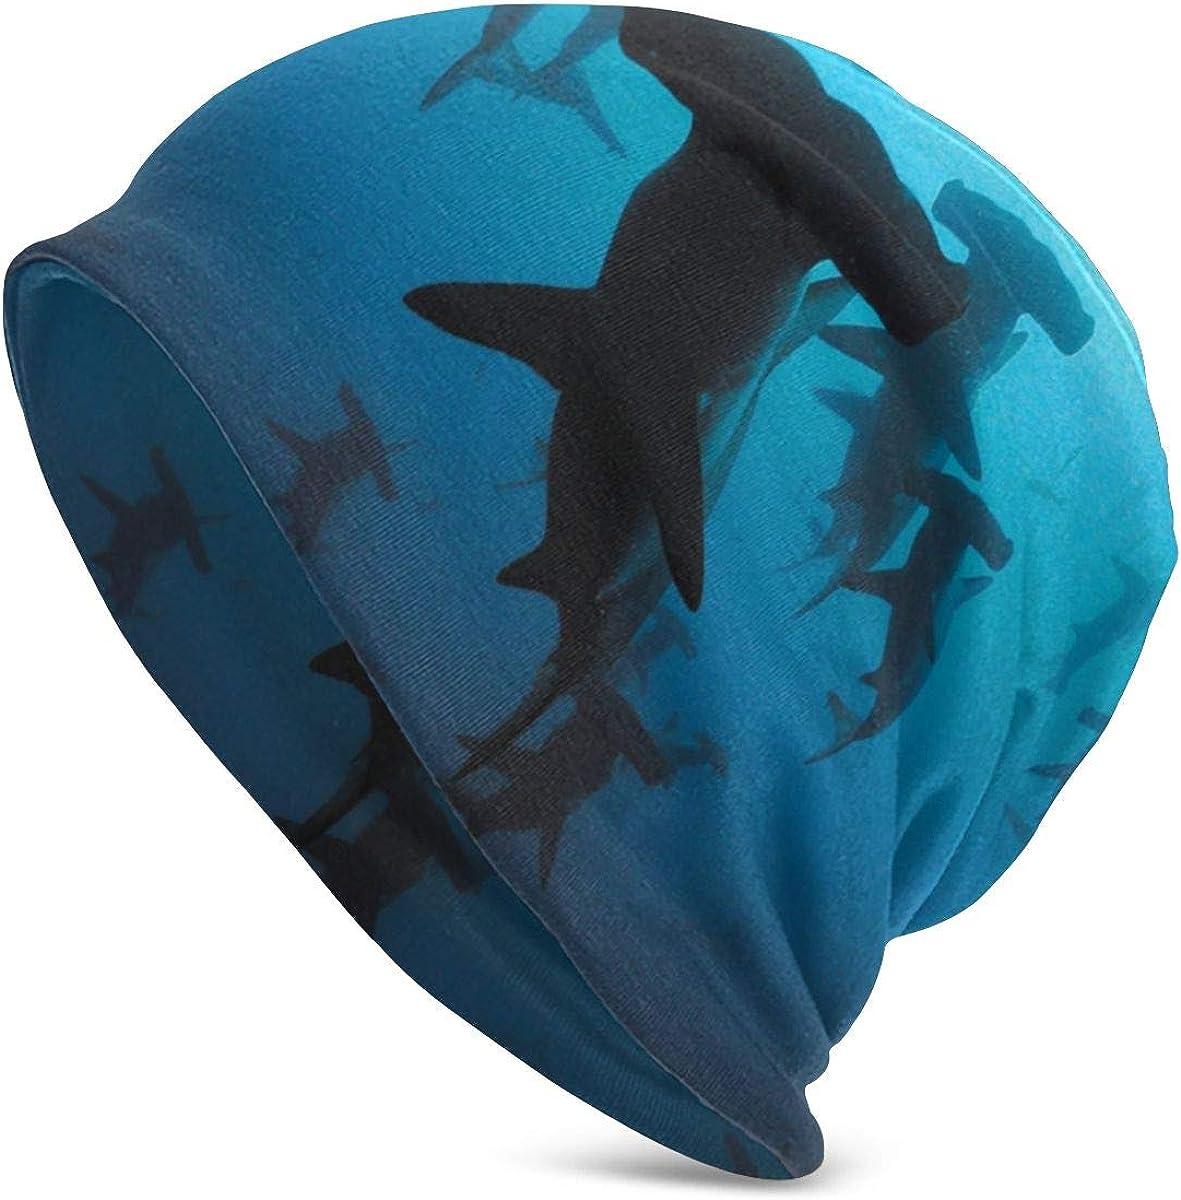 Bird of Paradise Beanie Hat for Men and Women - Warm Unisex Cuffed Plain Skull Knit Hat Cap